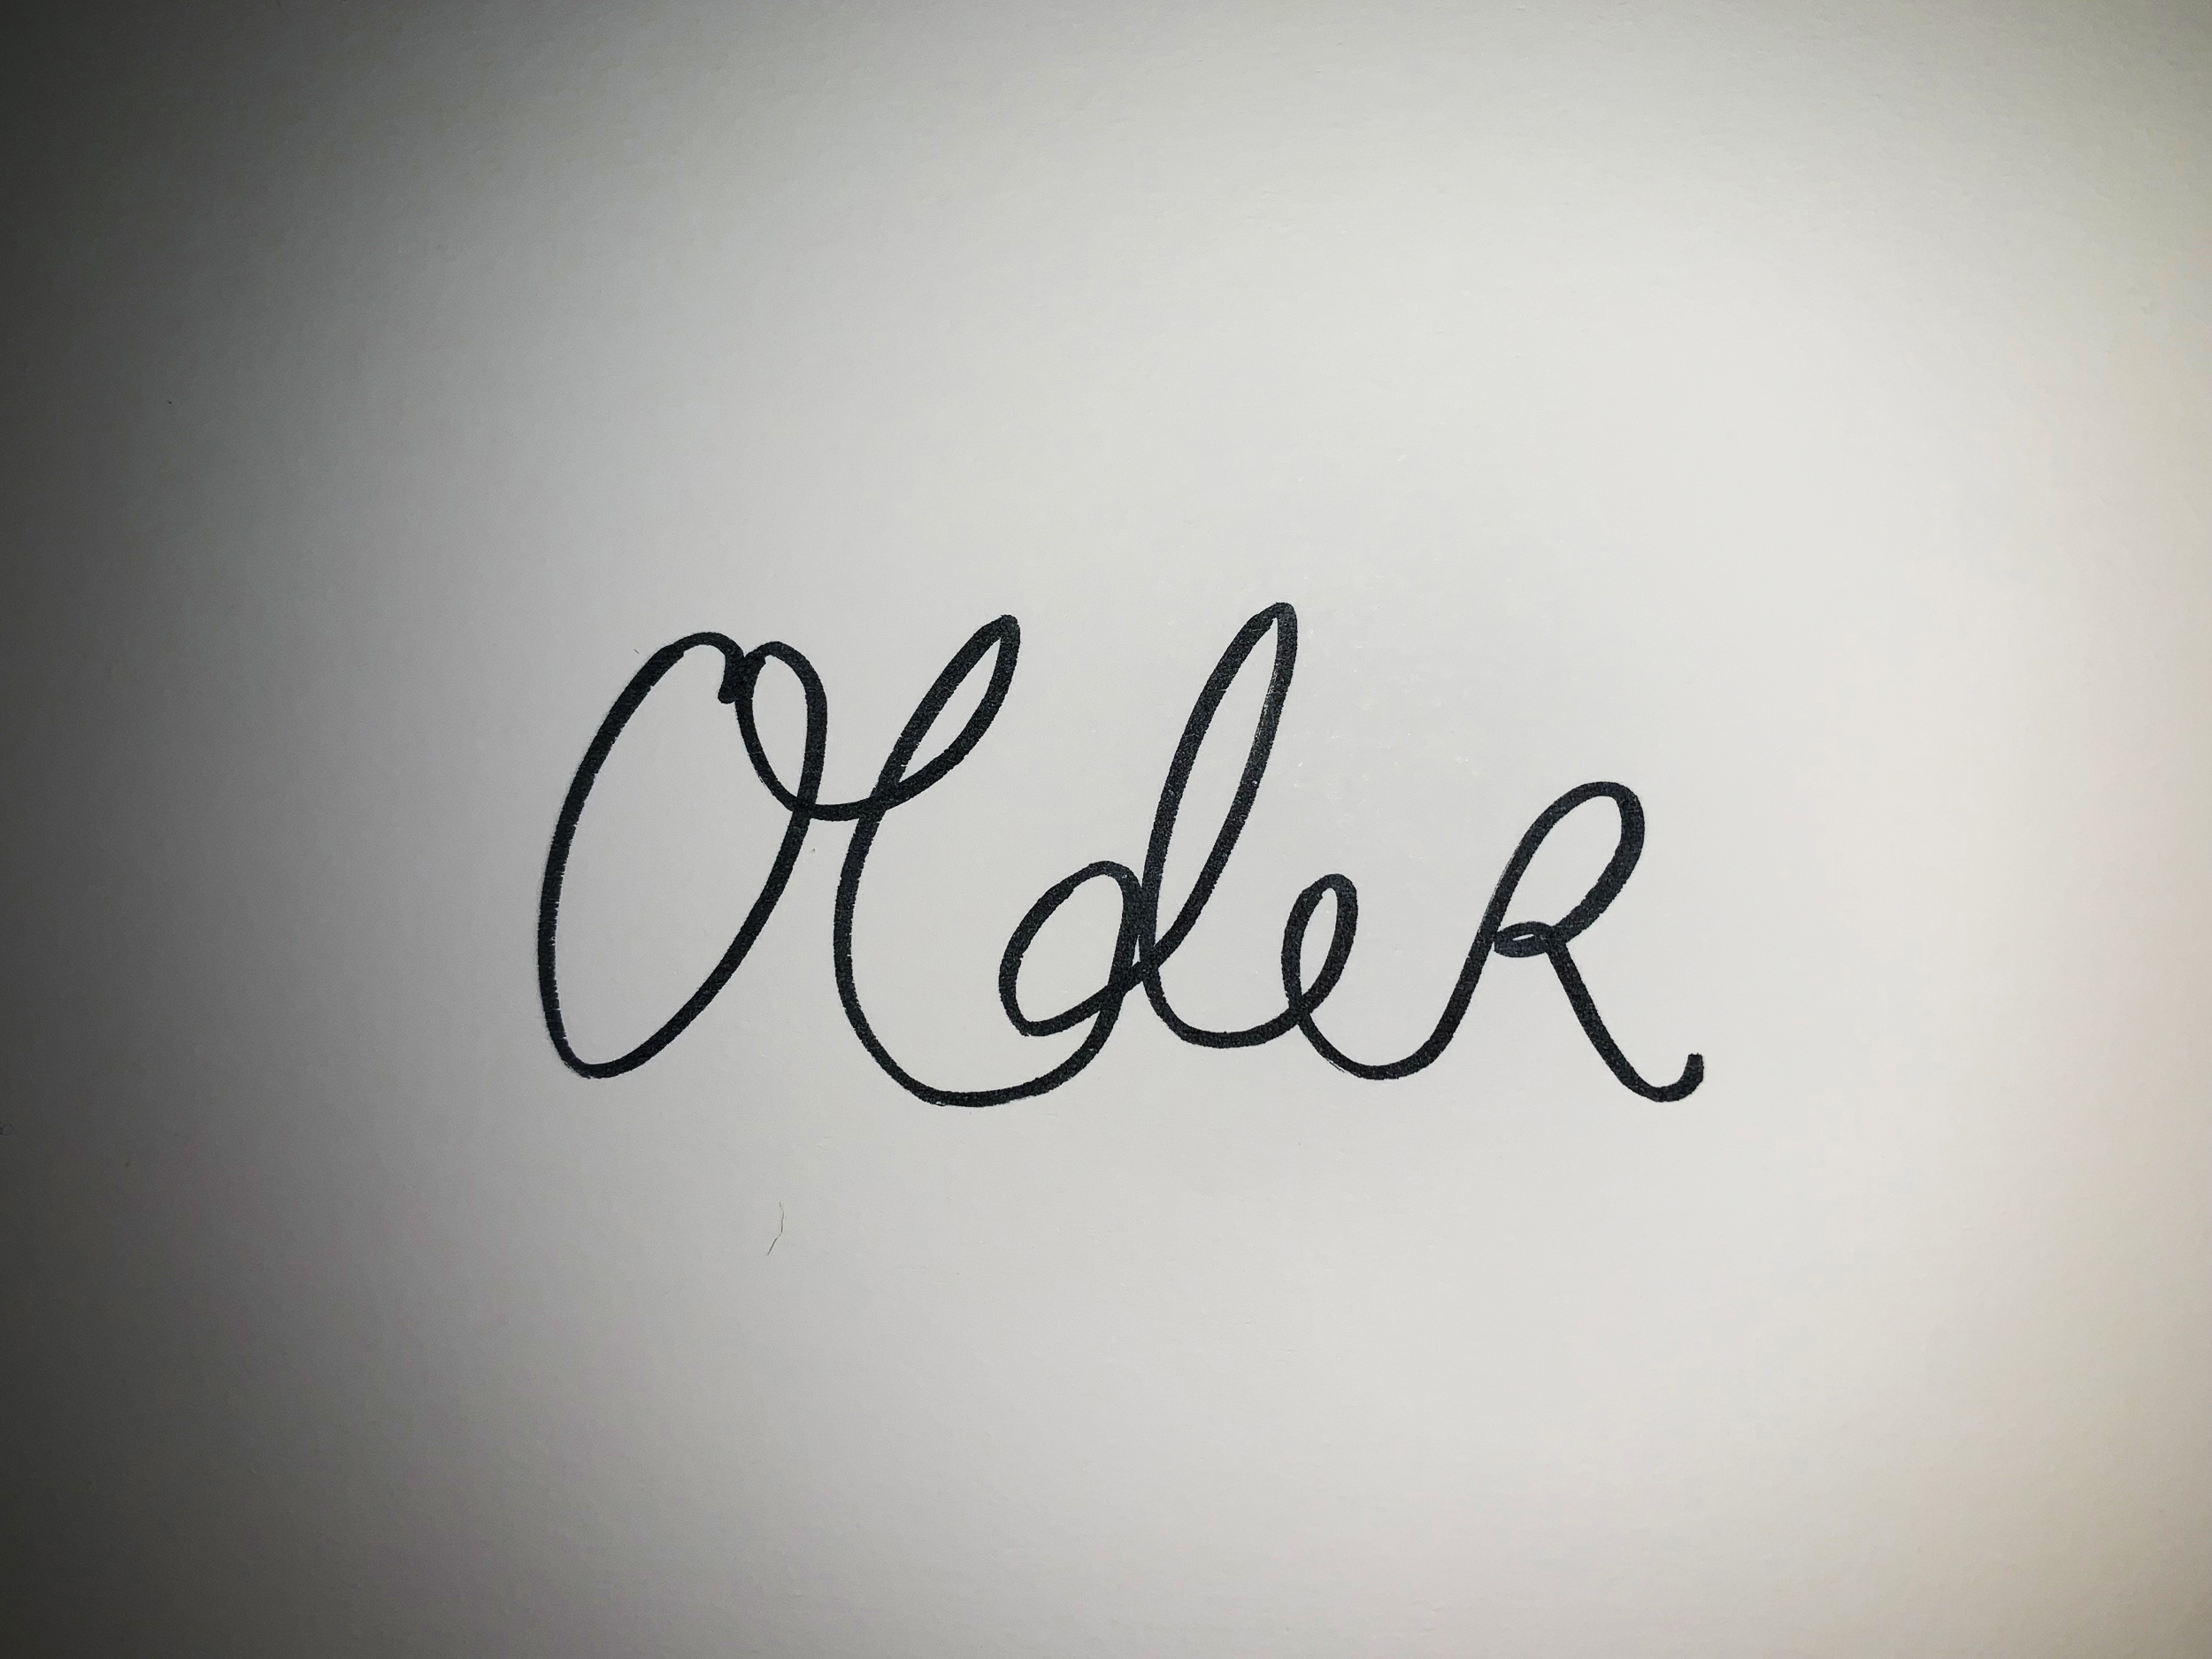 Older. Drawing Luke Hockley.